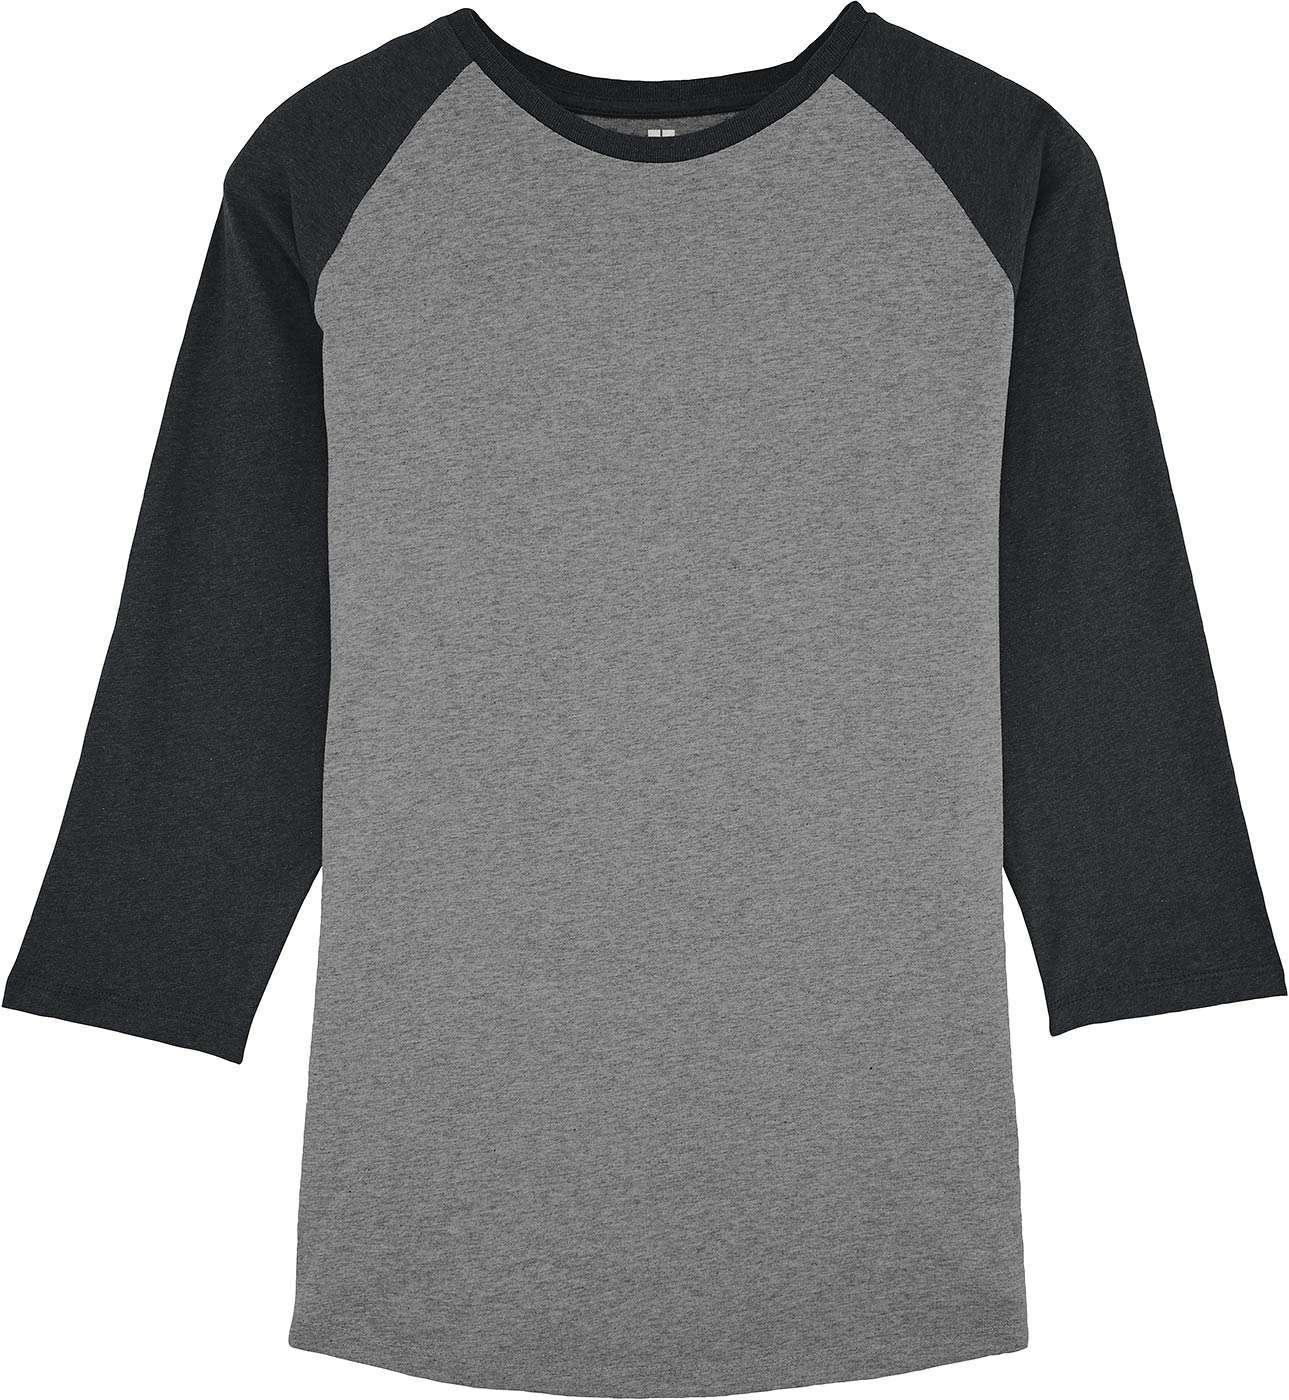 20b66243abef Faires Bio Baseballshirt dunkelgrau  grau meliert   grundstoff.net